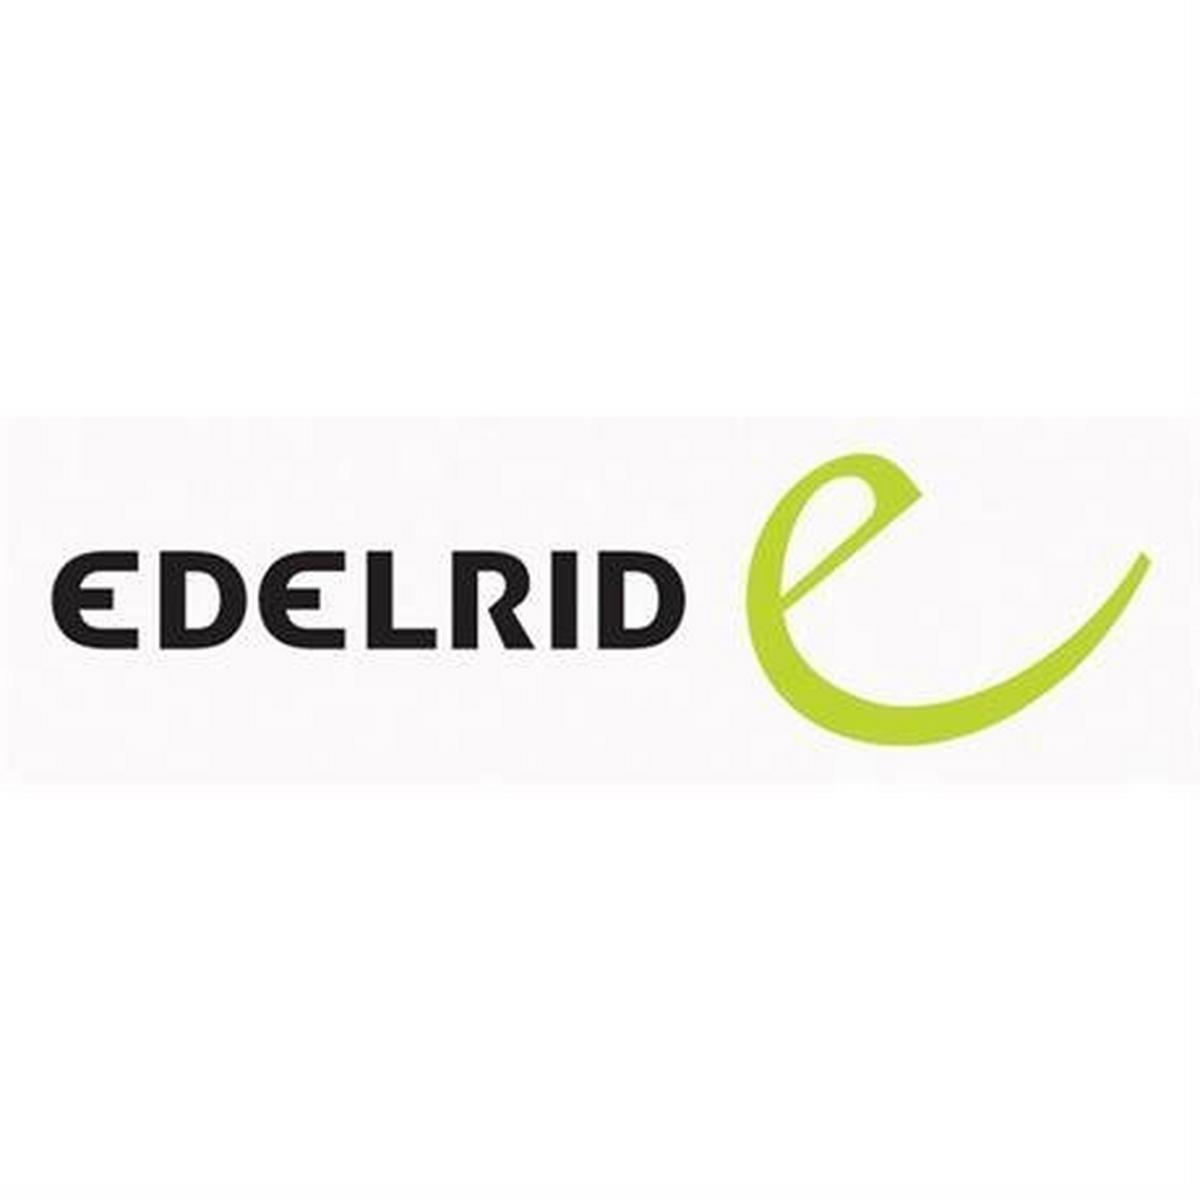 Edelrid Rope Peformance Static 10.5 mm White